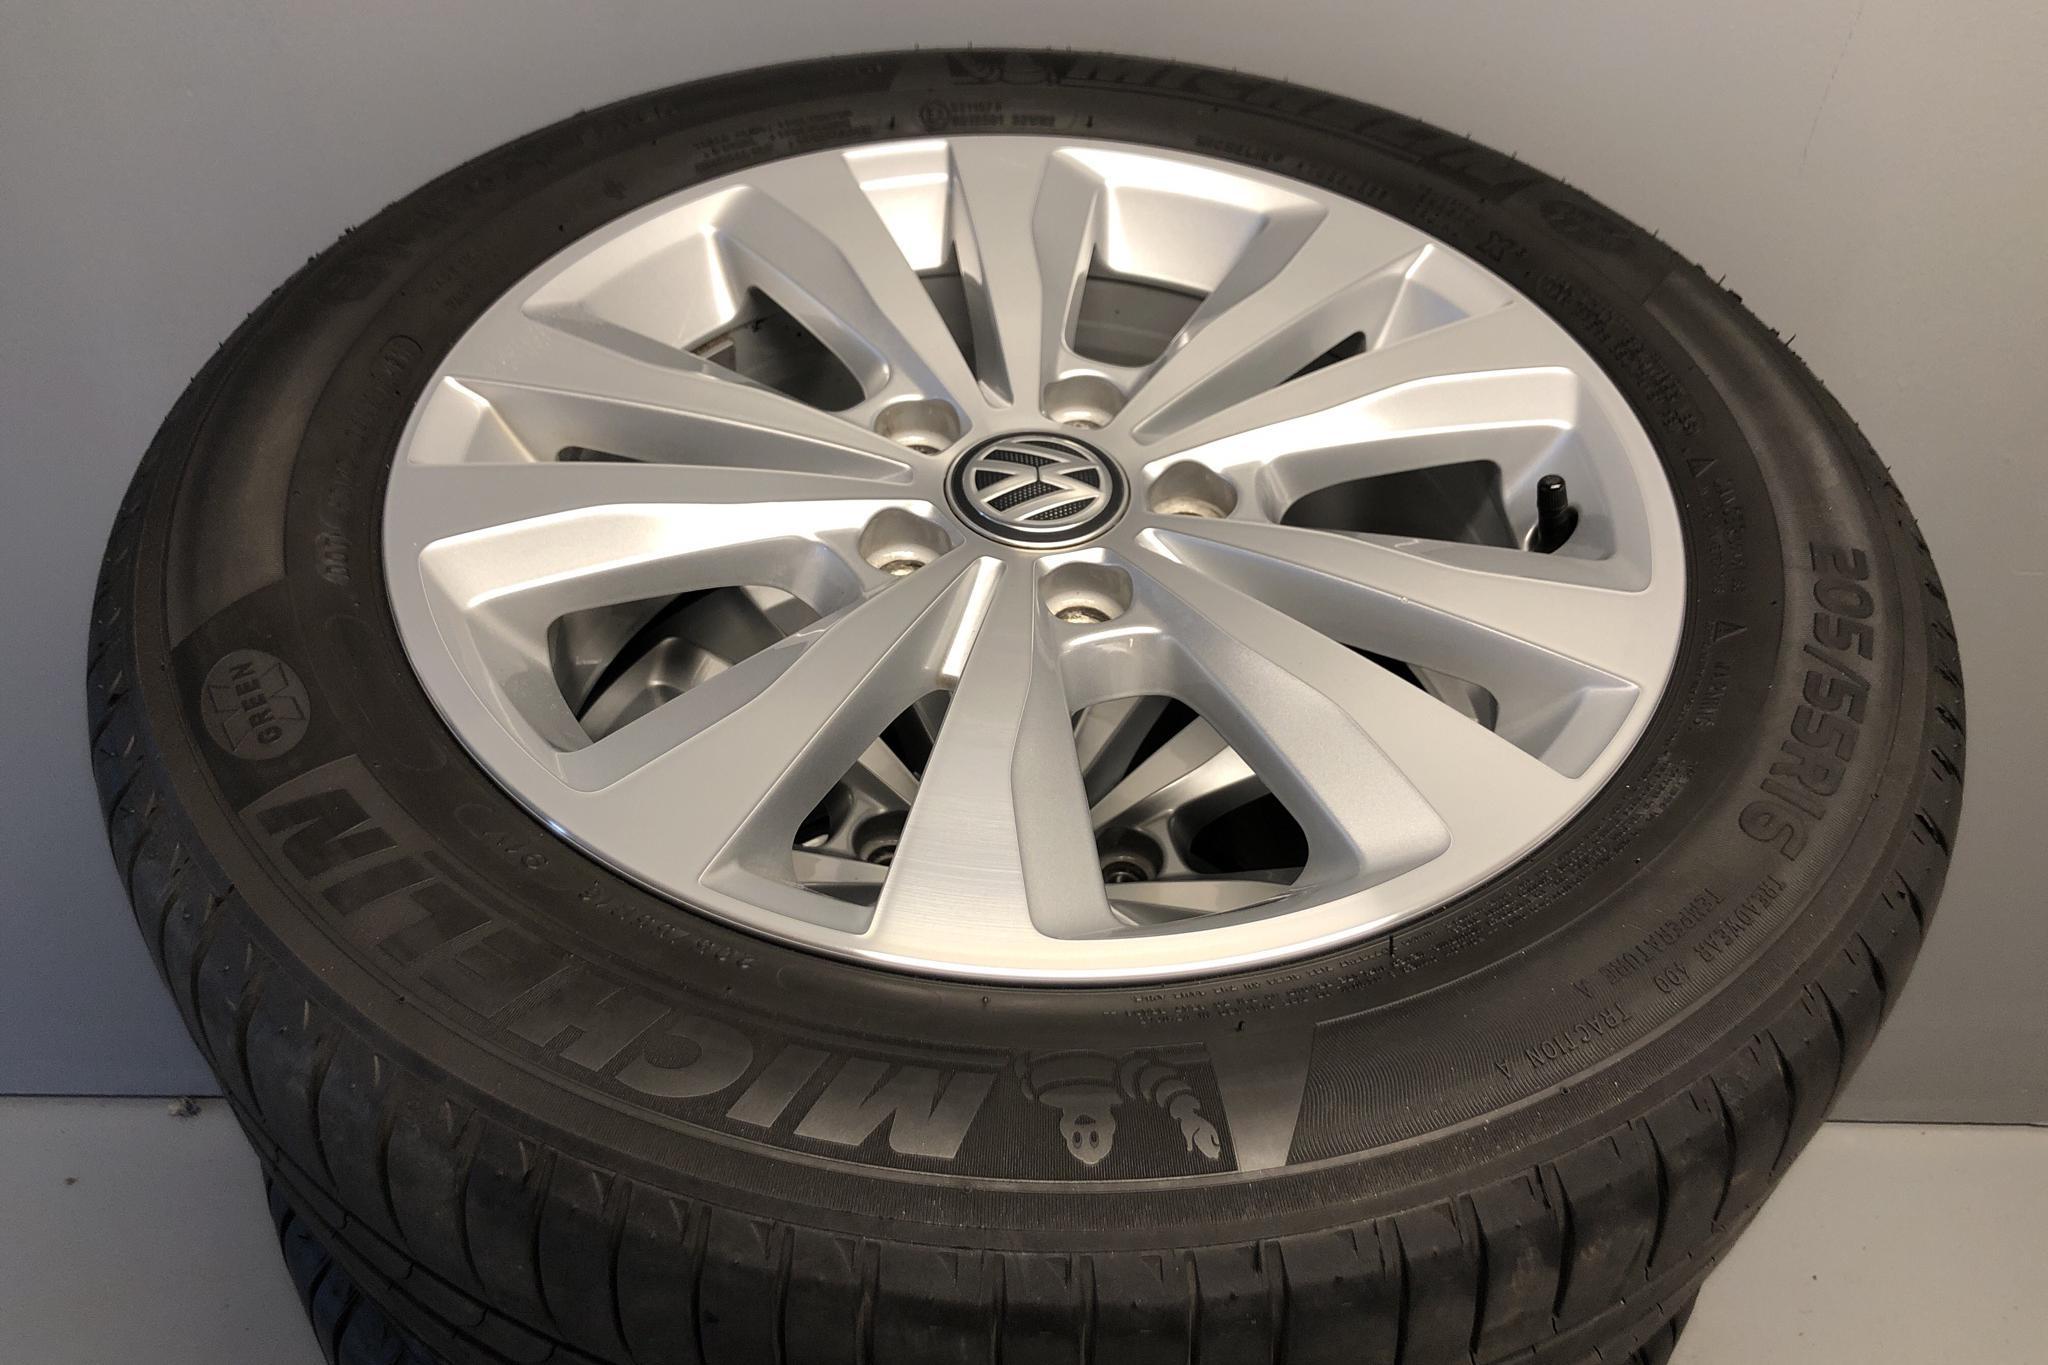 VW Golf VII 1.0 TSI 5dr (110hk) - 50 310 km - Manual - Dark Blue - 2018